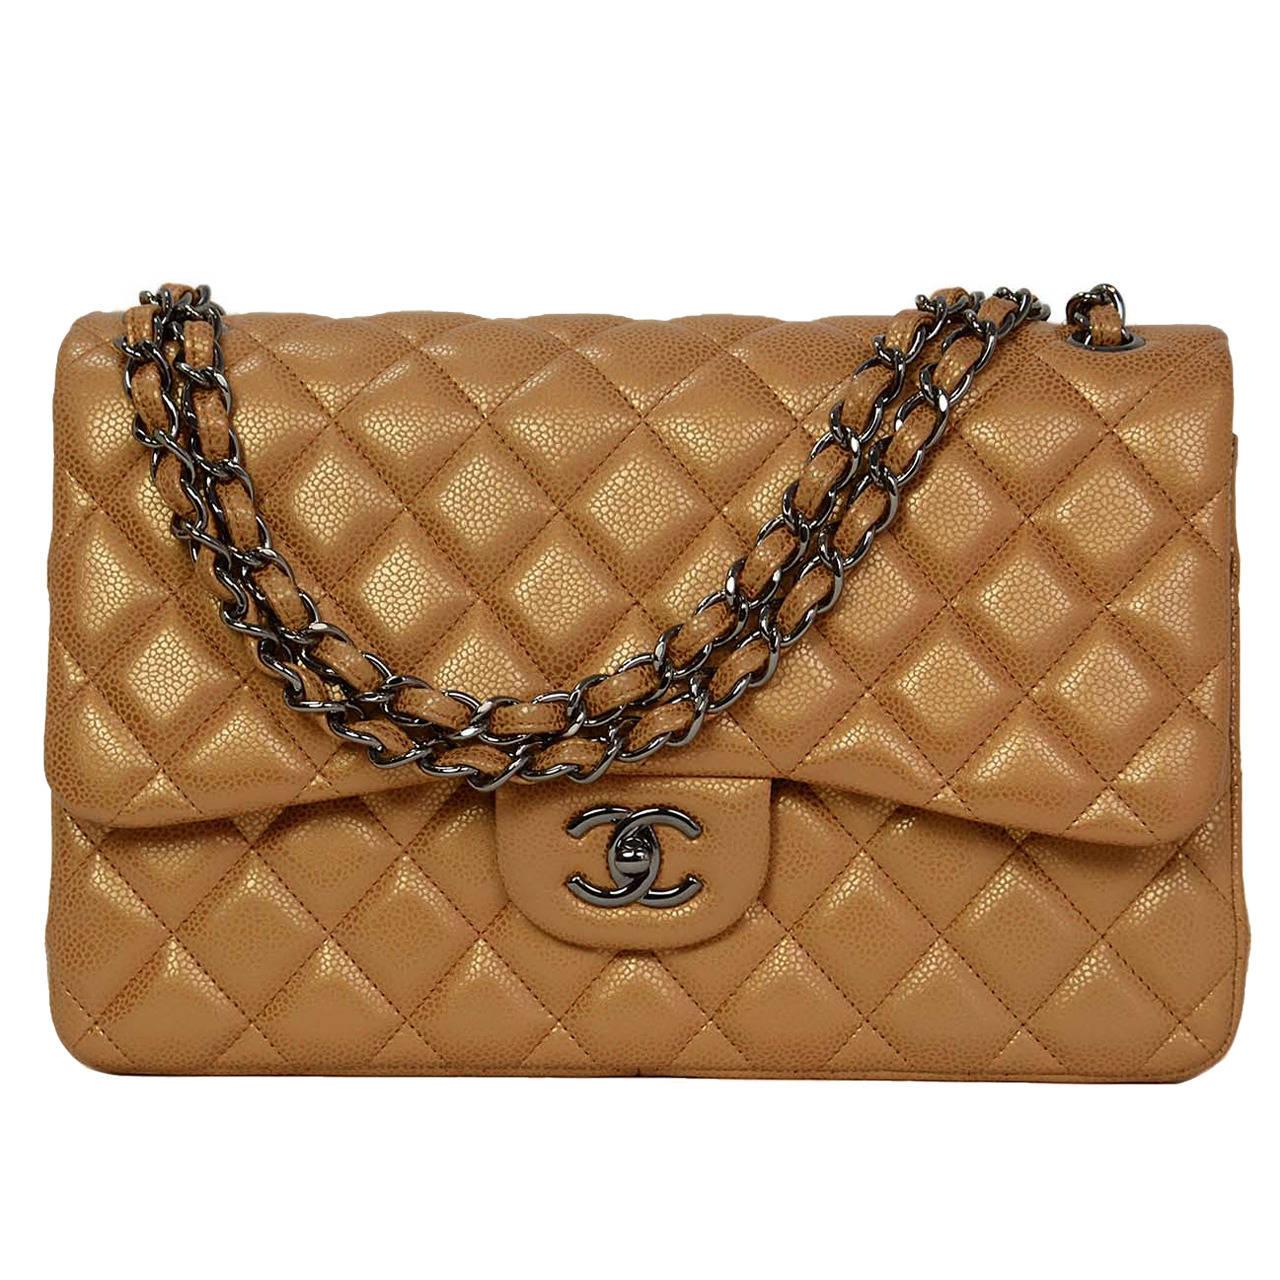 b54b58da080433 Chanel Metallic Gold Caviar Leather Double Flap Large Jumbo Classic Bag For  Sale